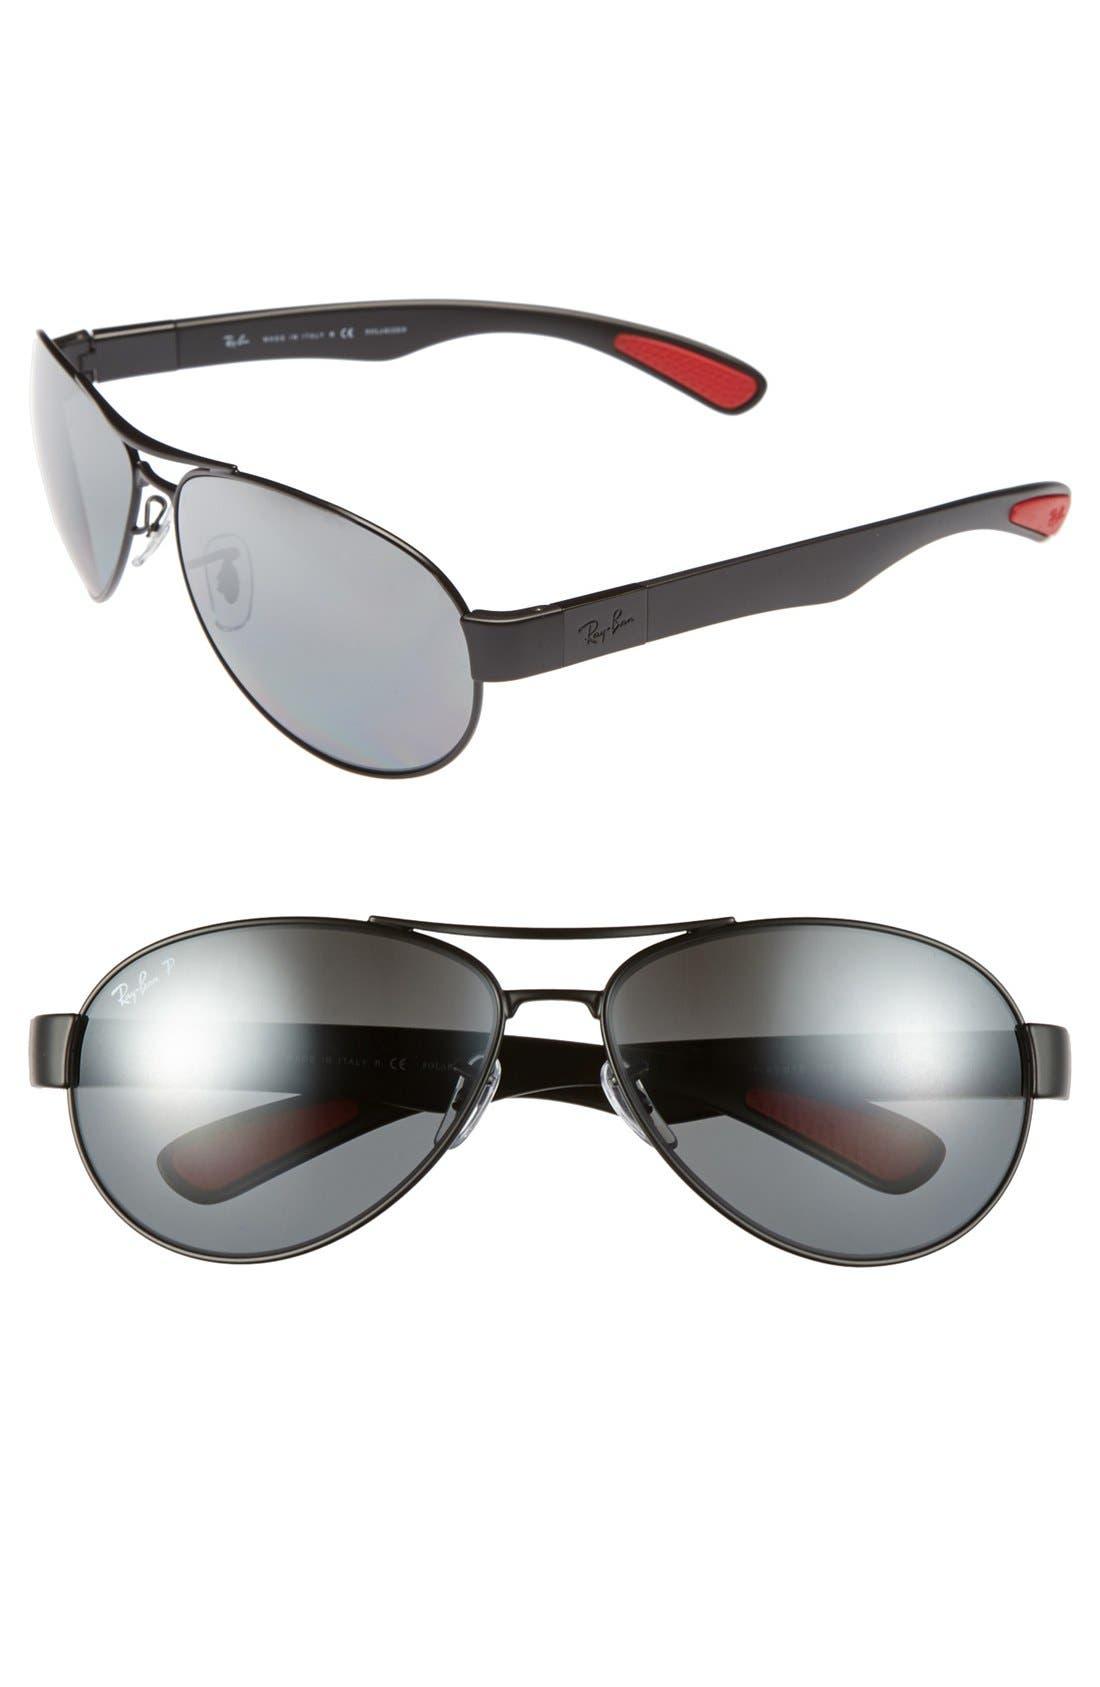 Main Image - Ray-Ban 'Pilot' Polarized Sunglasses